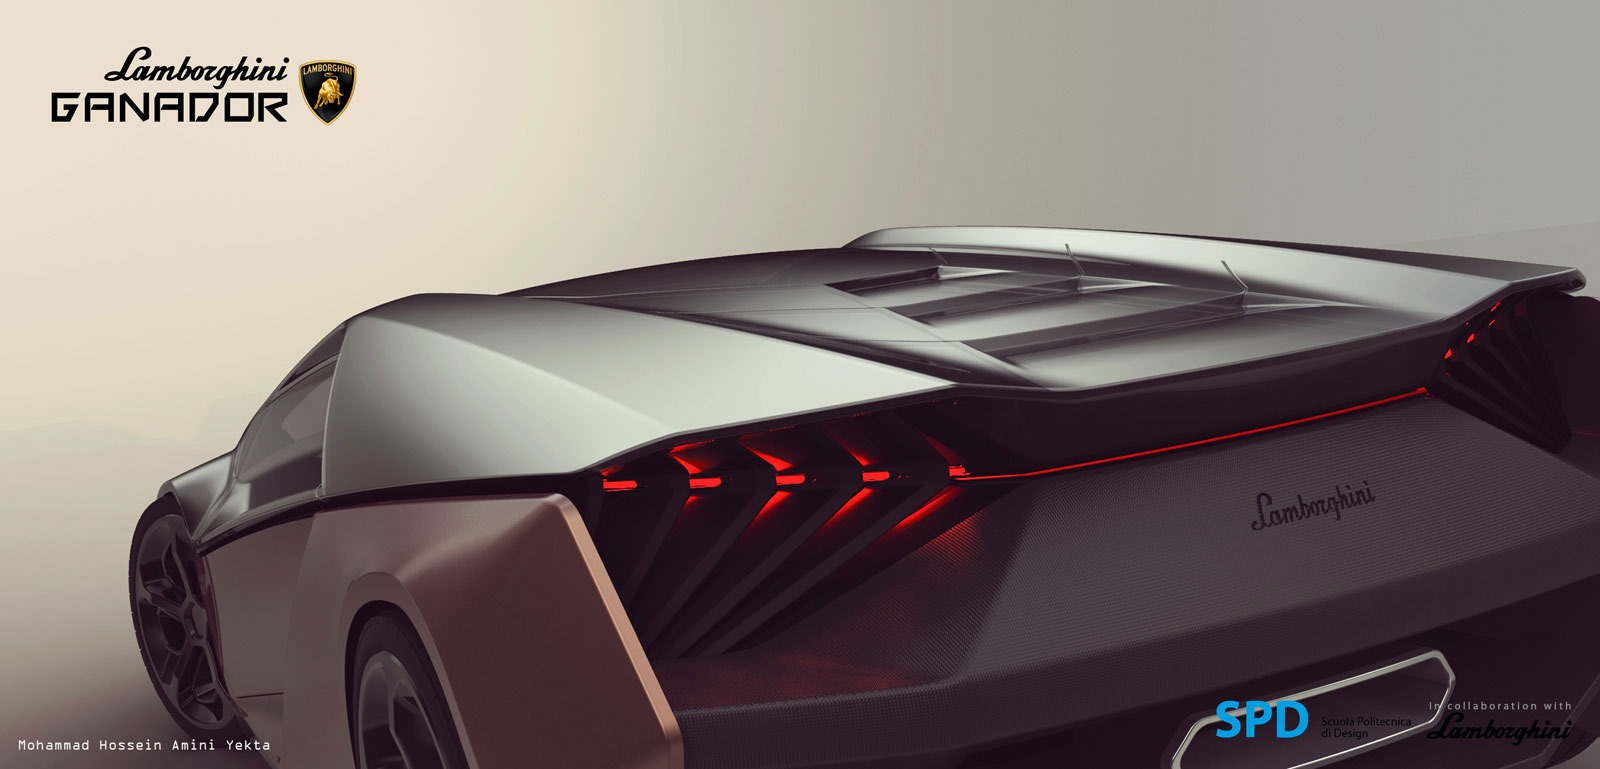 Lamborghini Ganador Concept Foto 9 Di 20